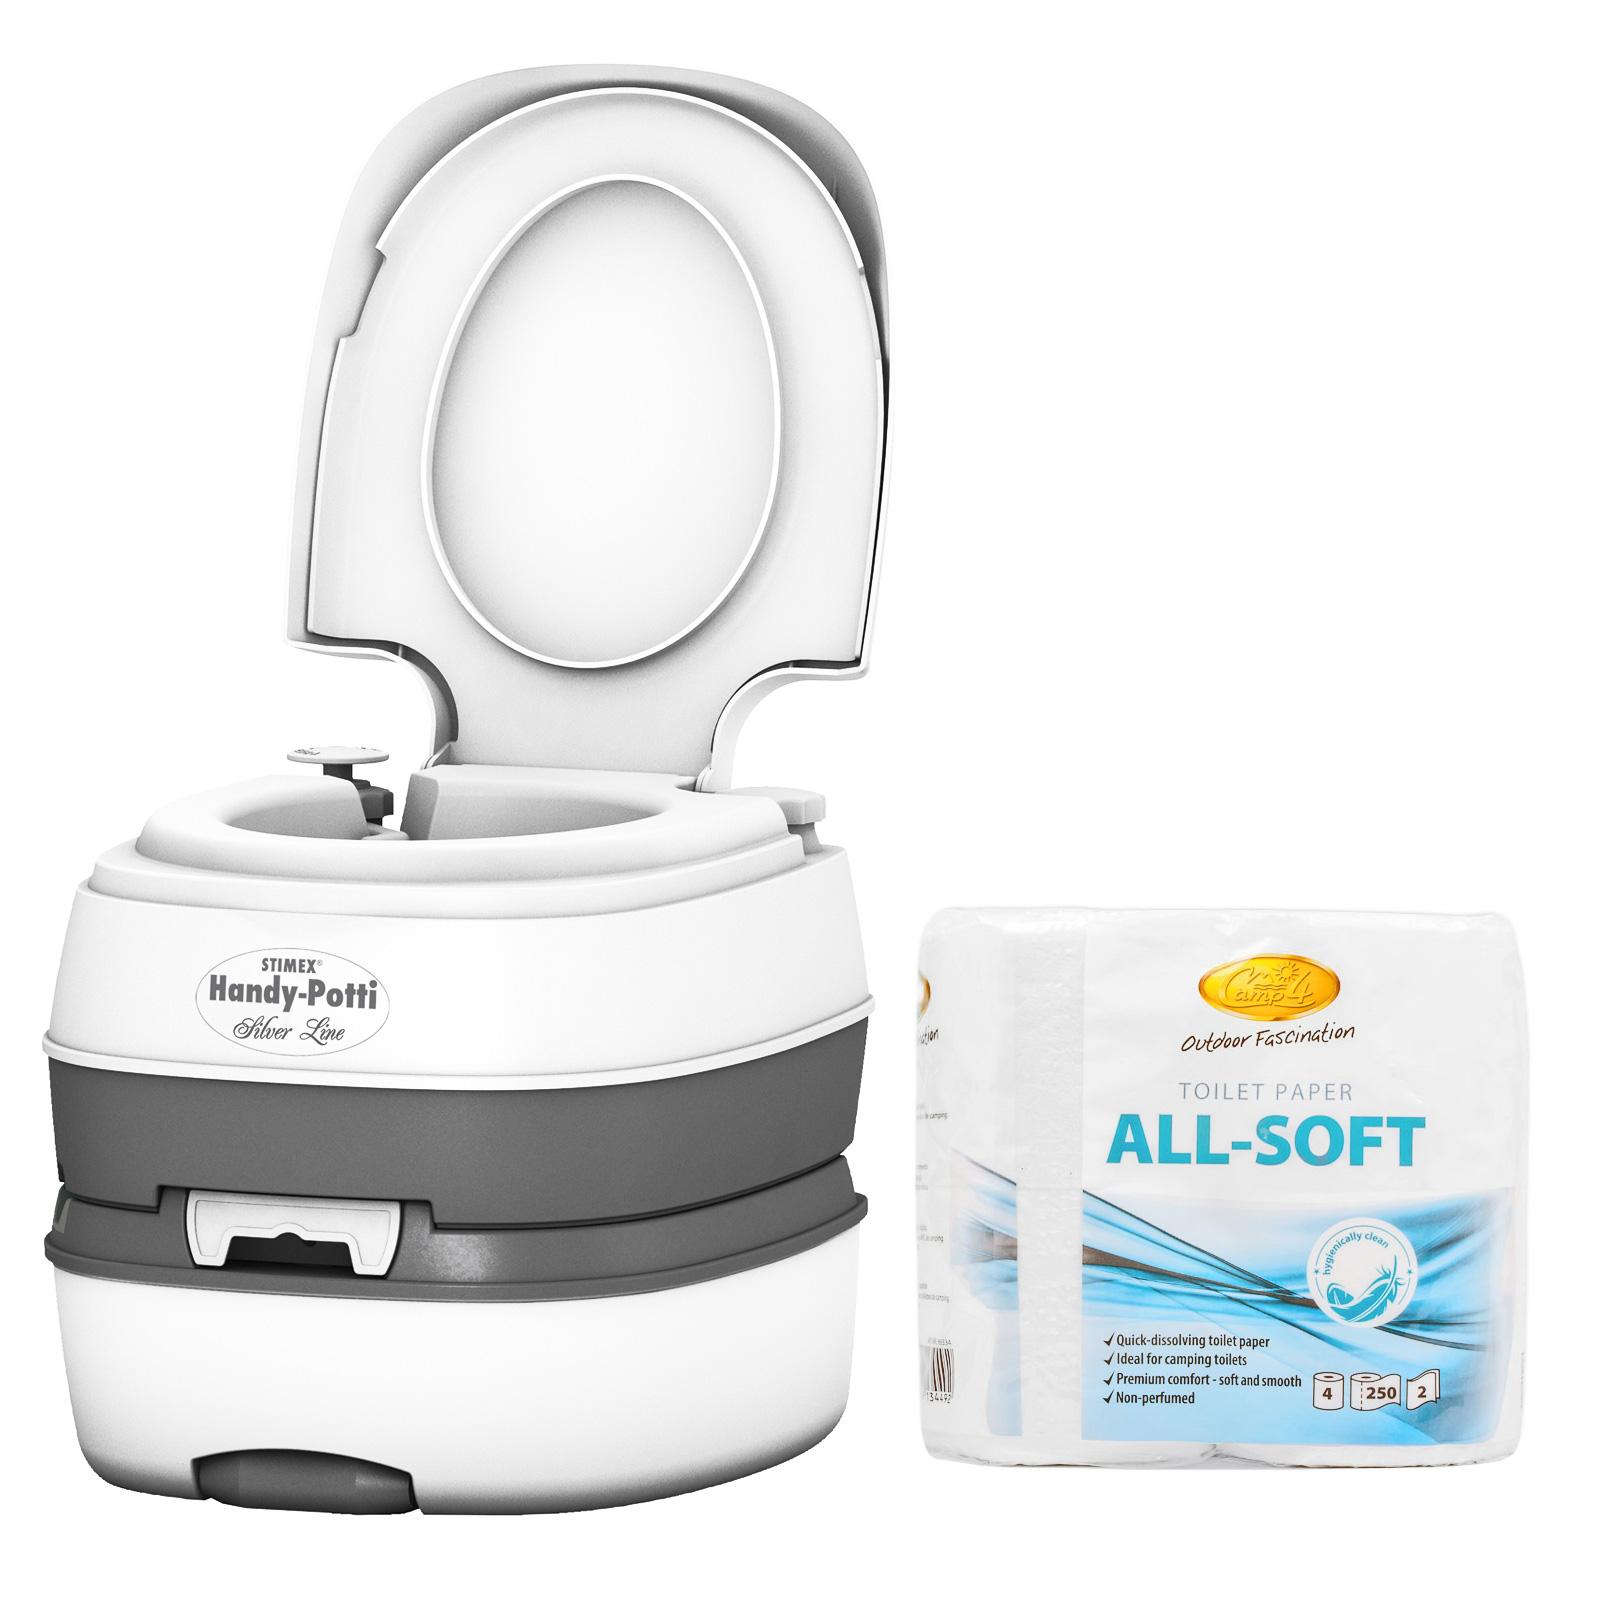 STIMEX Campingtoilette, Kunststoff, Kolbenpumpe, 3,8 kg, weiß inkl. All-Soft